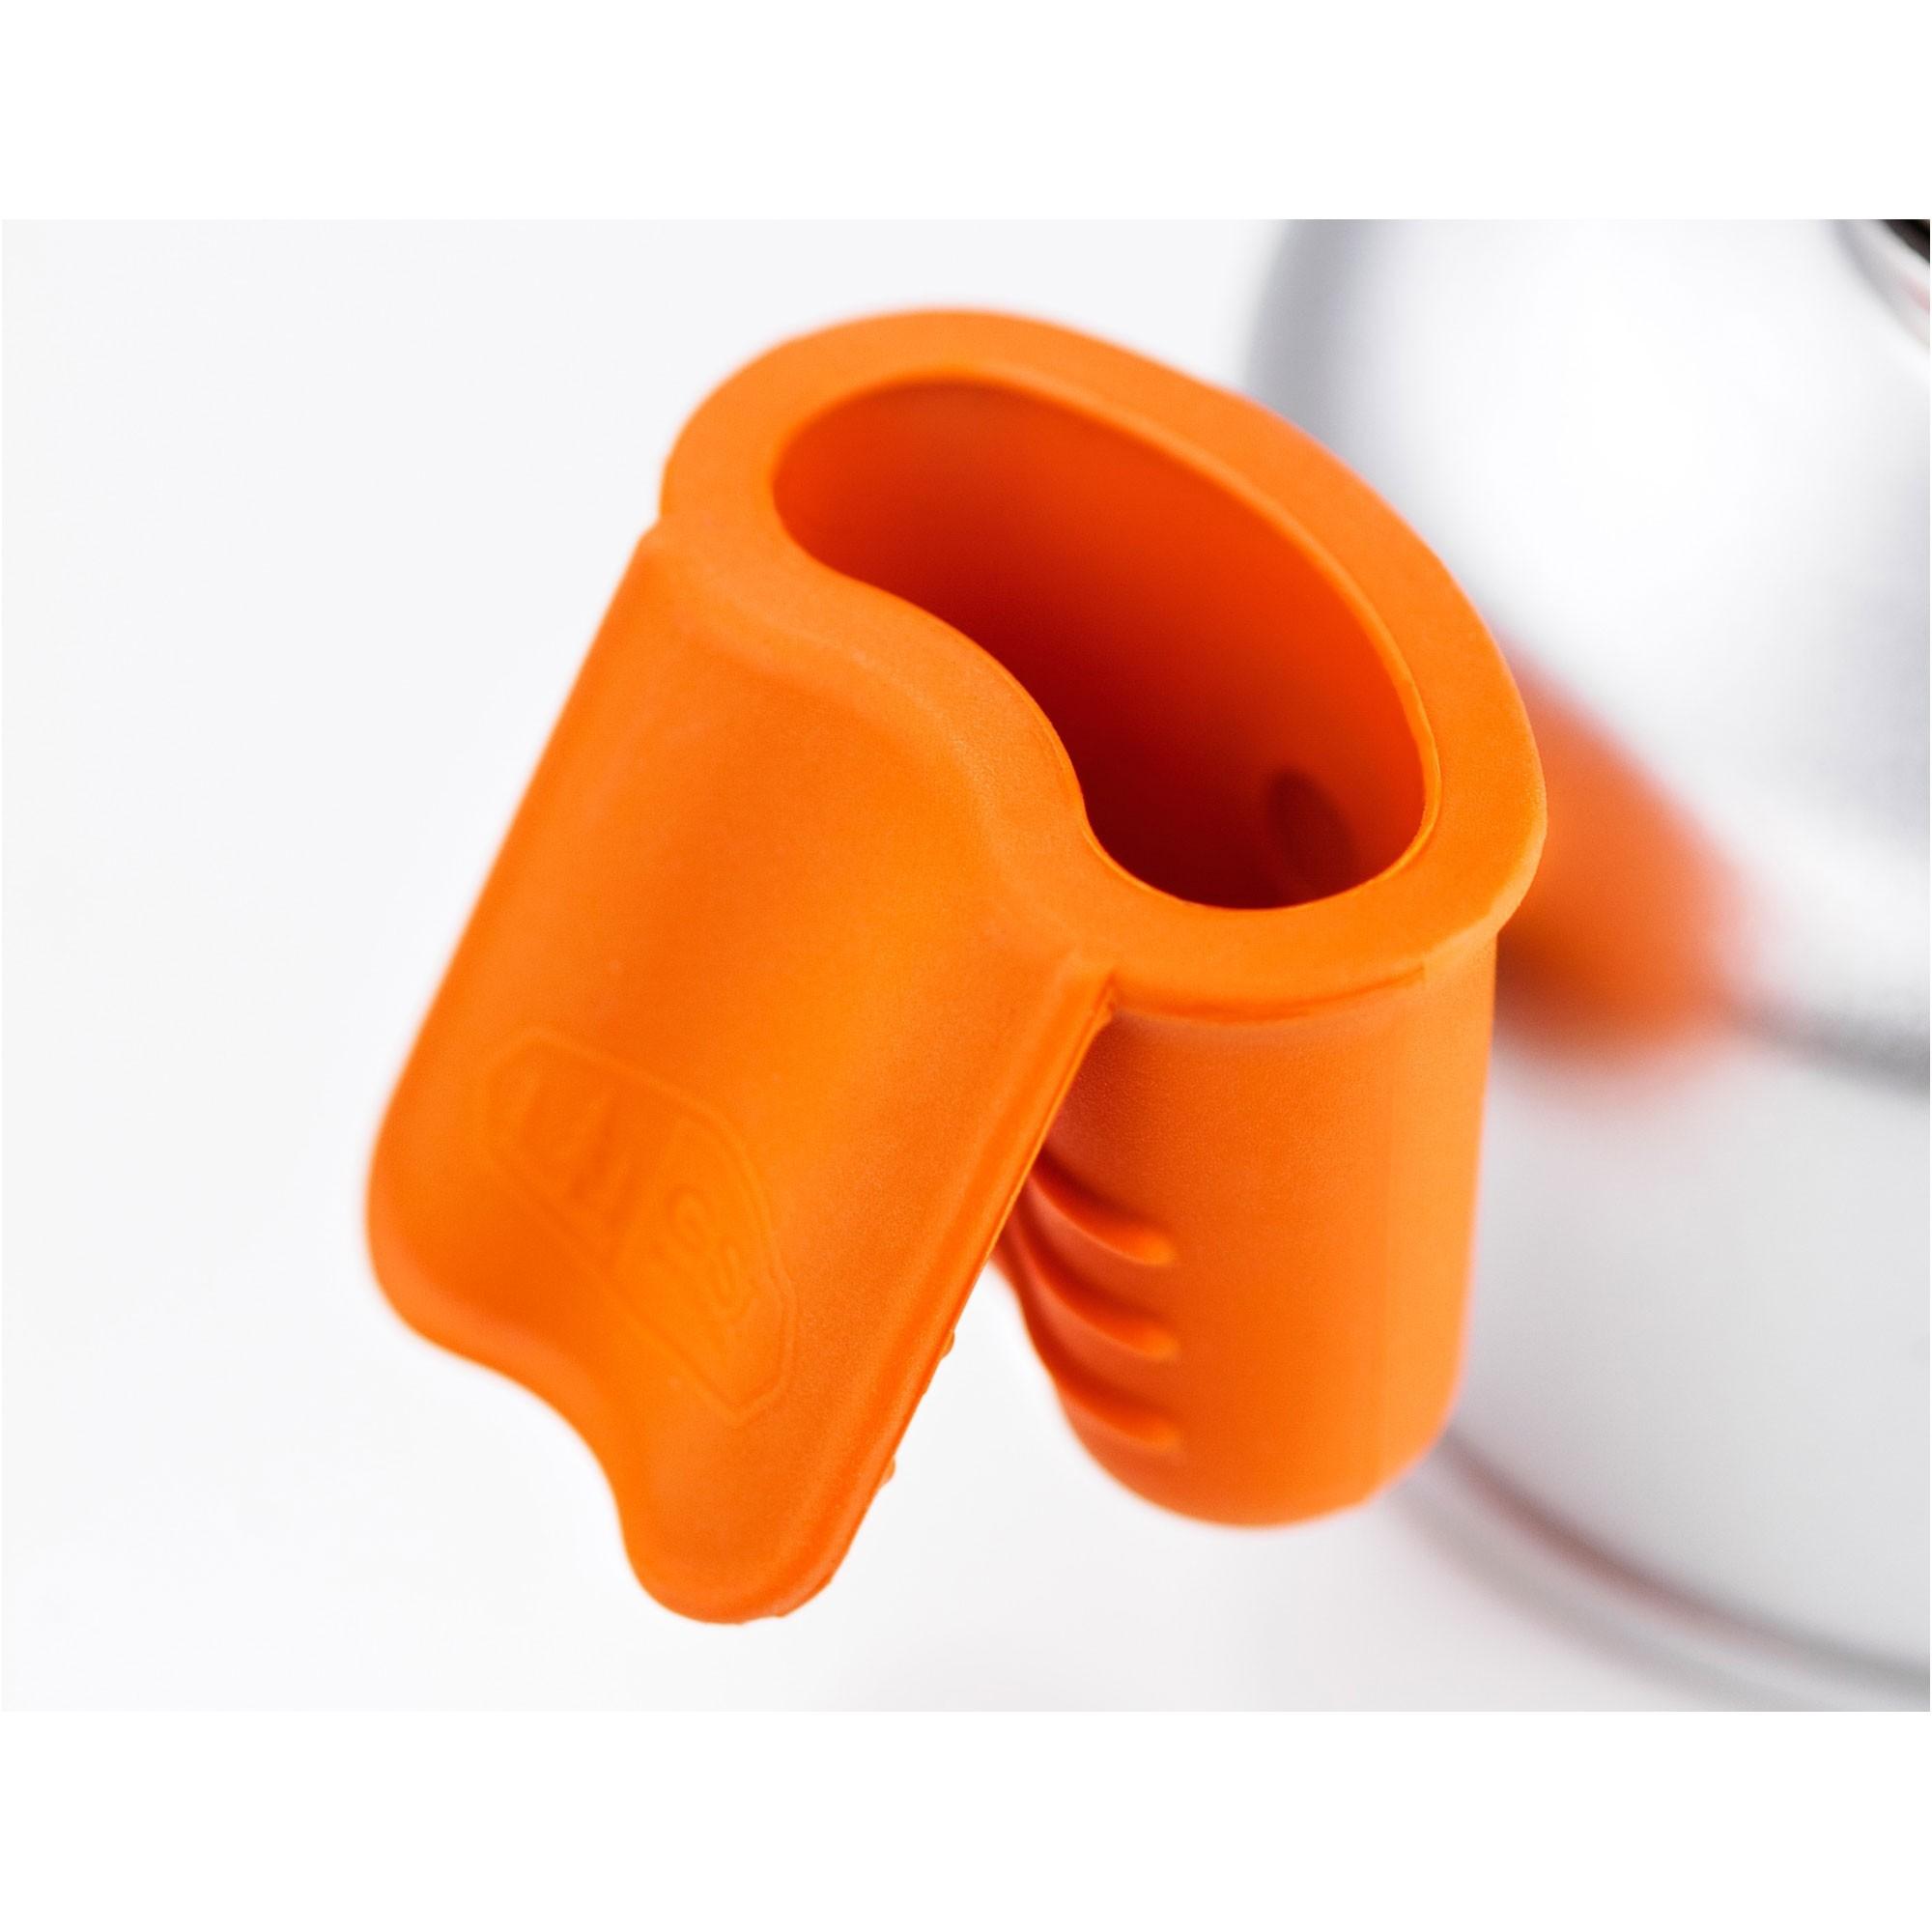 GSI Microgripper handle